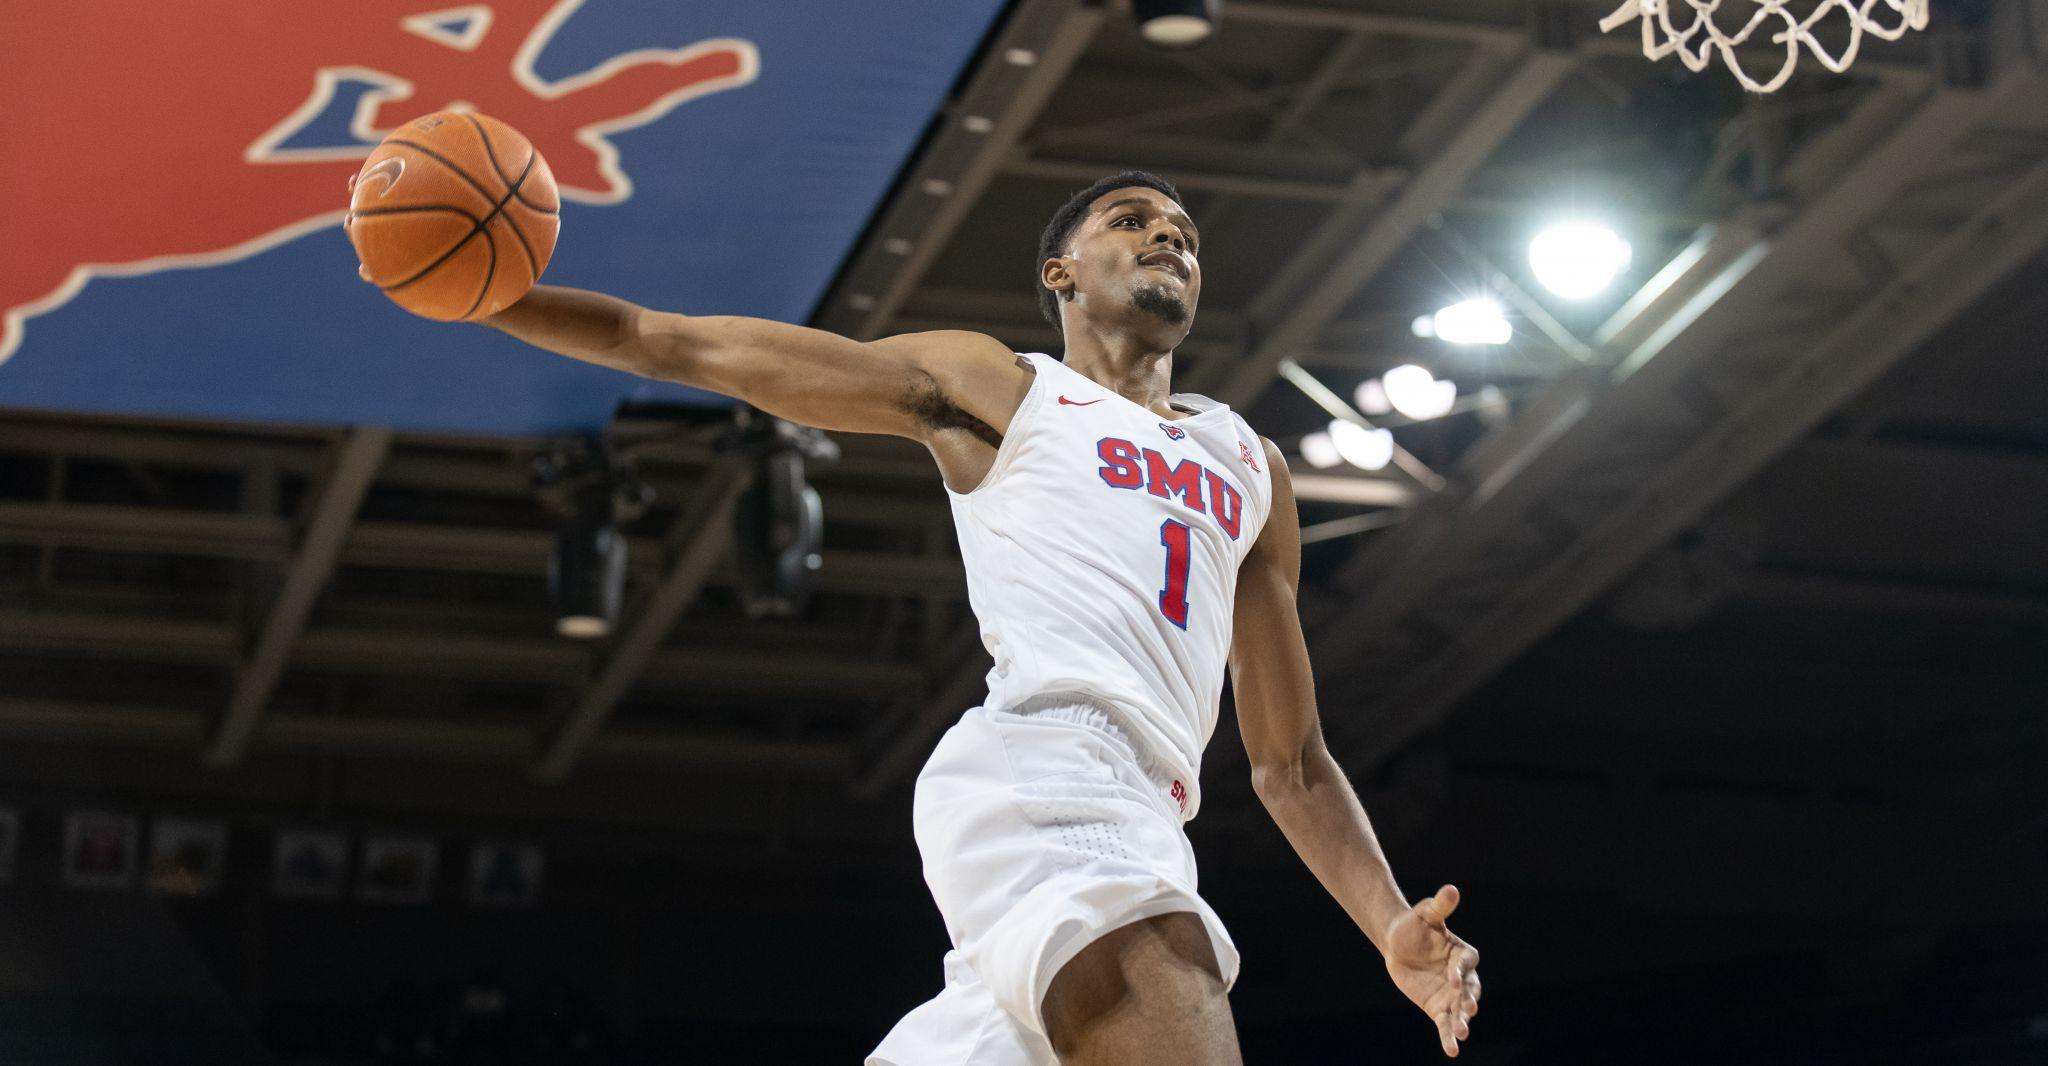 Men's basketball preview: No. 20 Houston at SMU